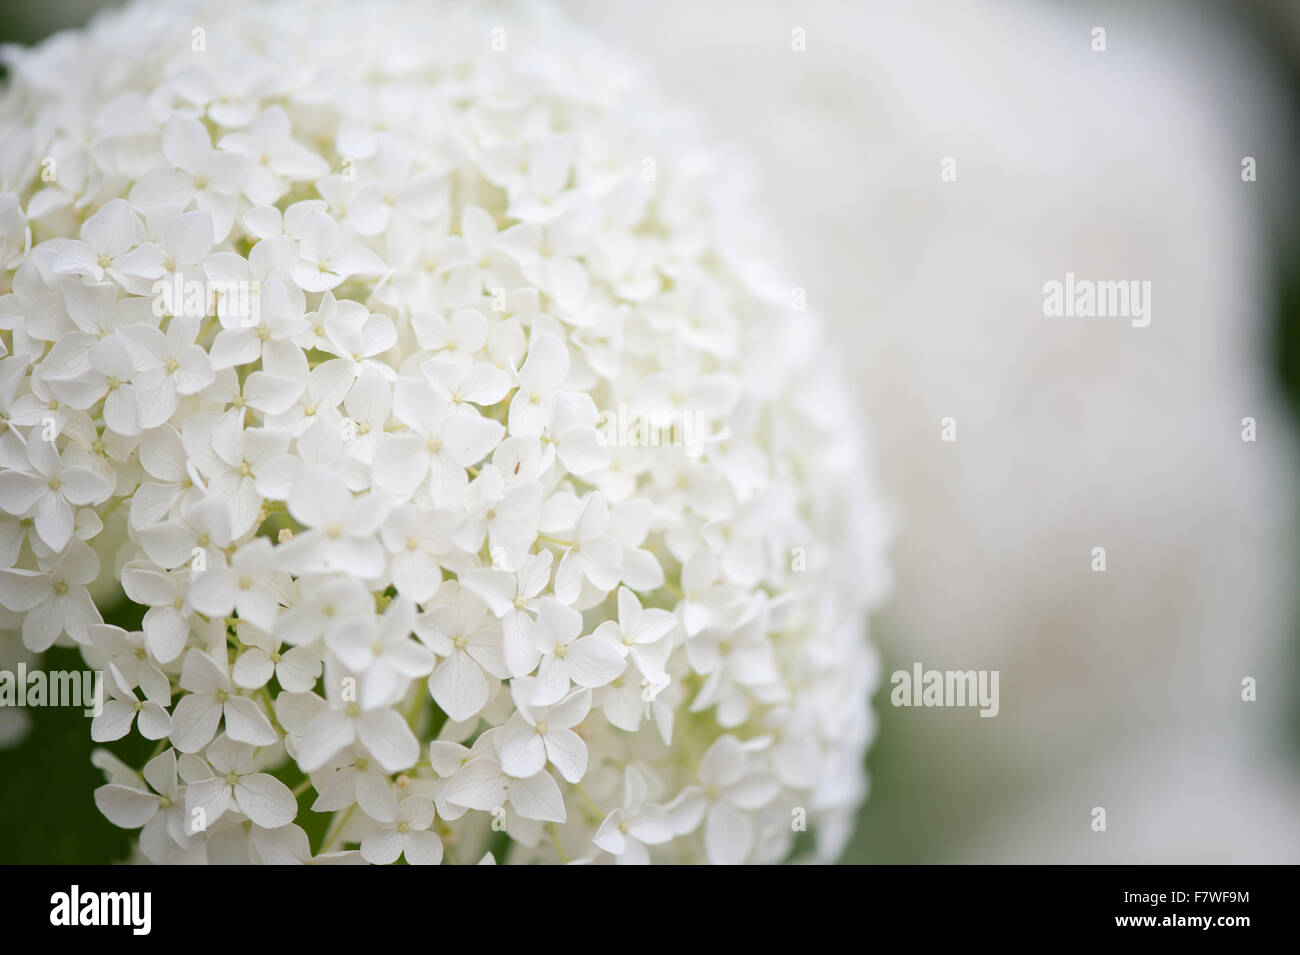 Spherical hydrangea flowering macro, plant blooming white creamy inflorescences, globular flowers show in July... Stock Photo